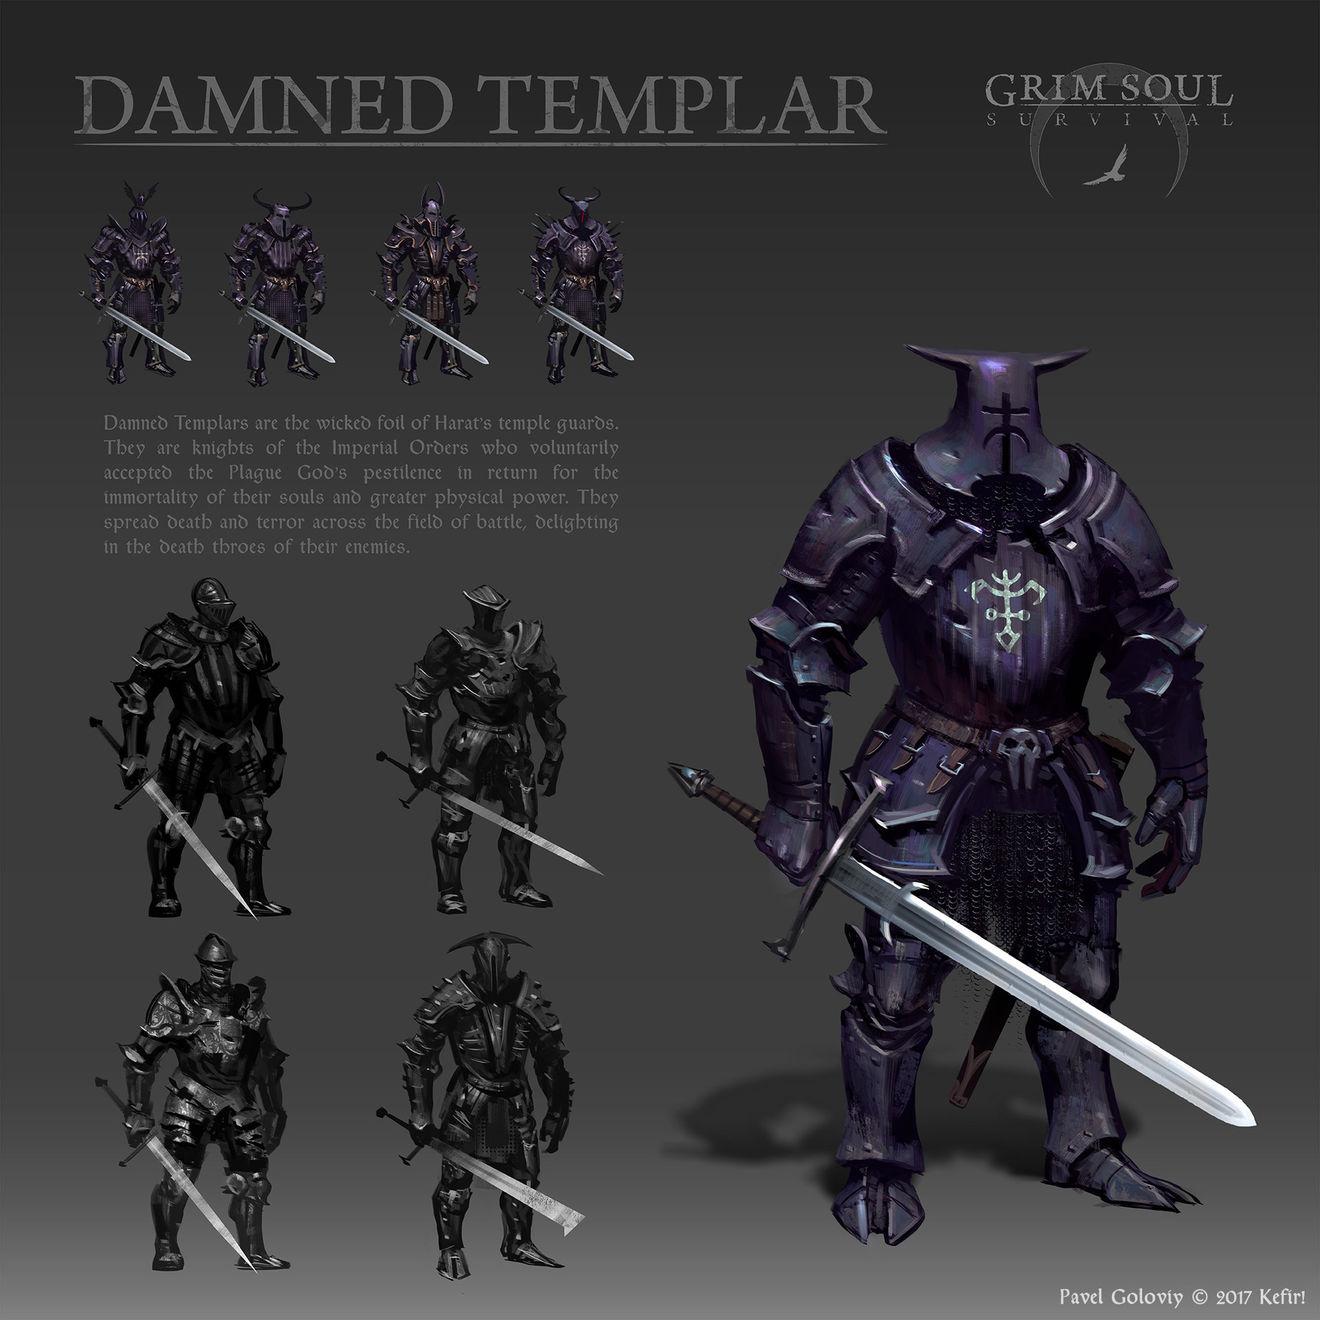 Grim Soul圣殿骑士攻略 圣殿骑士击杀视频推荐[多图]